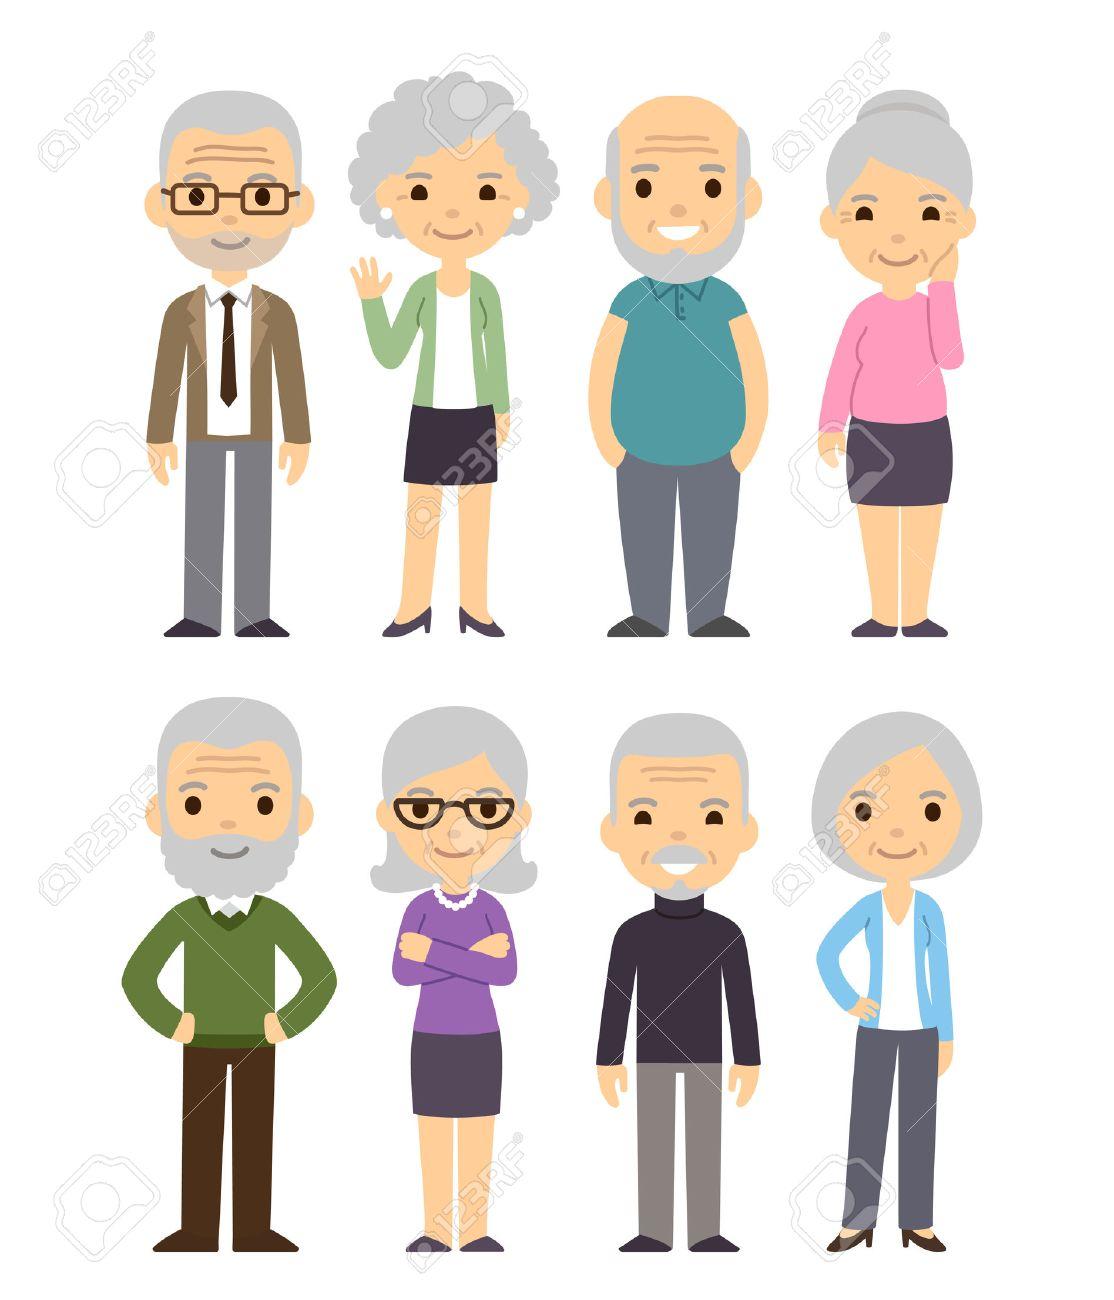 Cute cartoon senior people set. Happy old people, men and women, isolated flat vector illustration. - 57718192